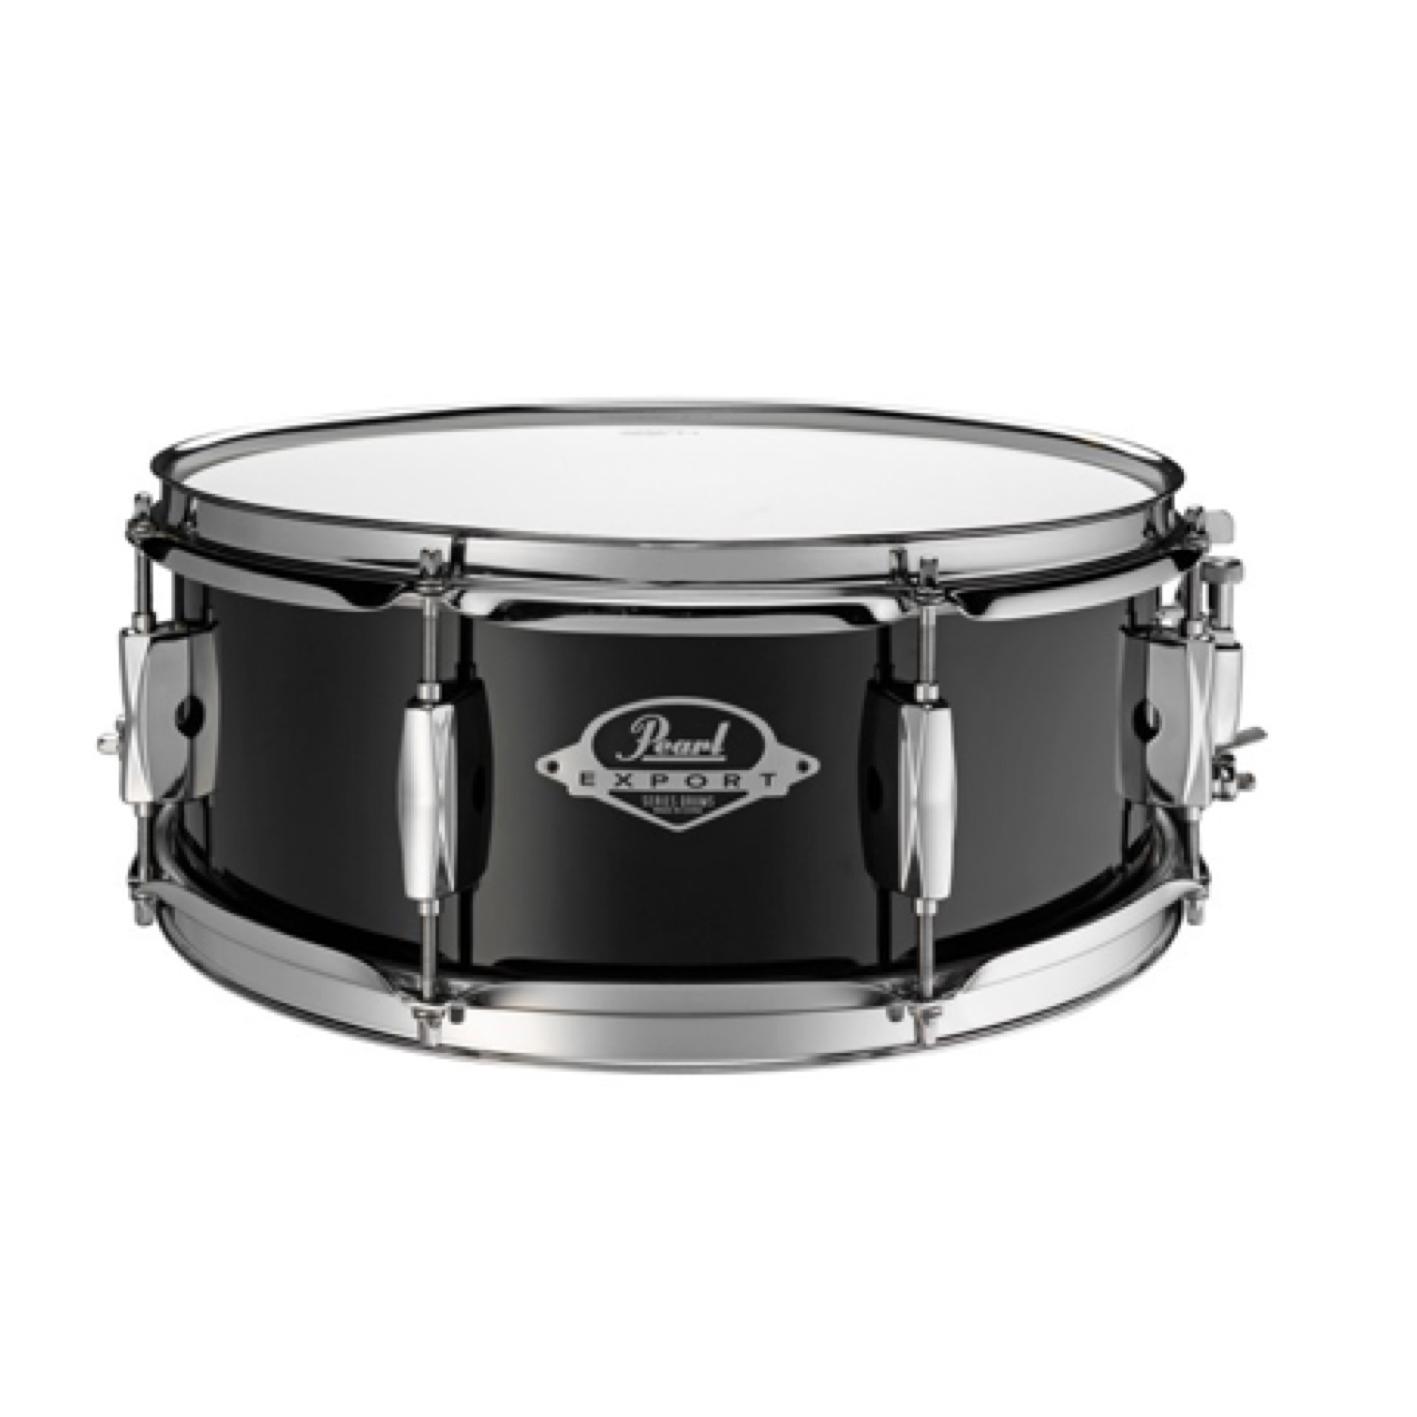 "Pearl Export 14x5.5"" Snare Drum Jet Black EXX1455s"